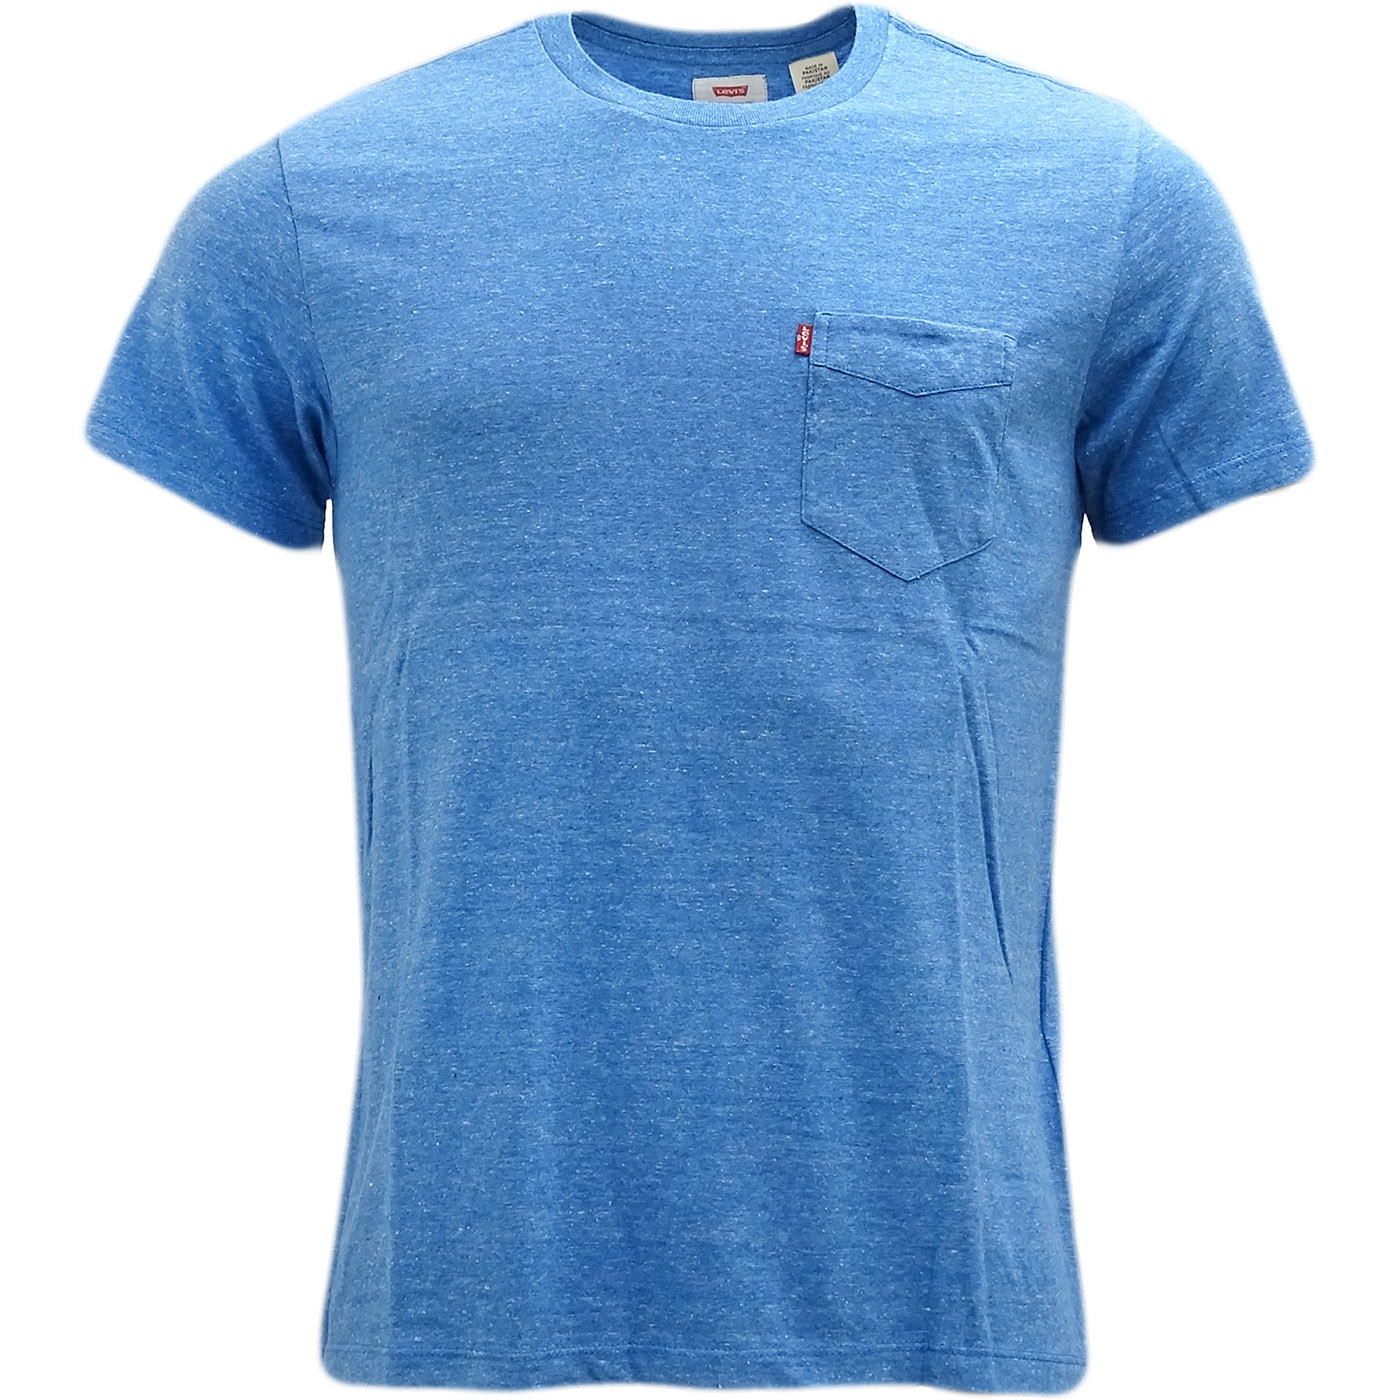 863bcbb52adc Sentinel Levi Strauss Plain Sunset Pocket Tee   Levi S T-Shirt - 29813